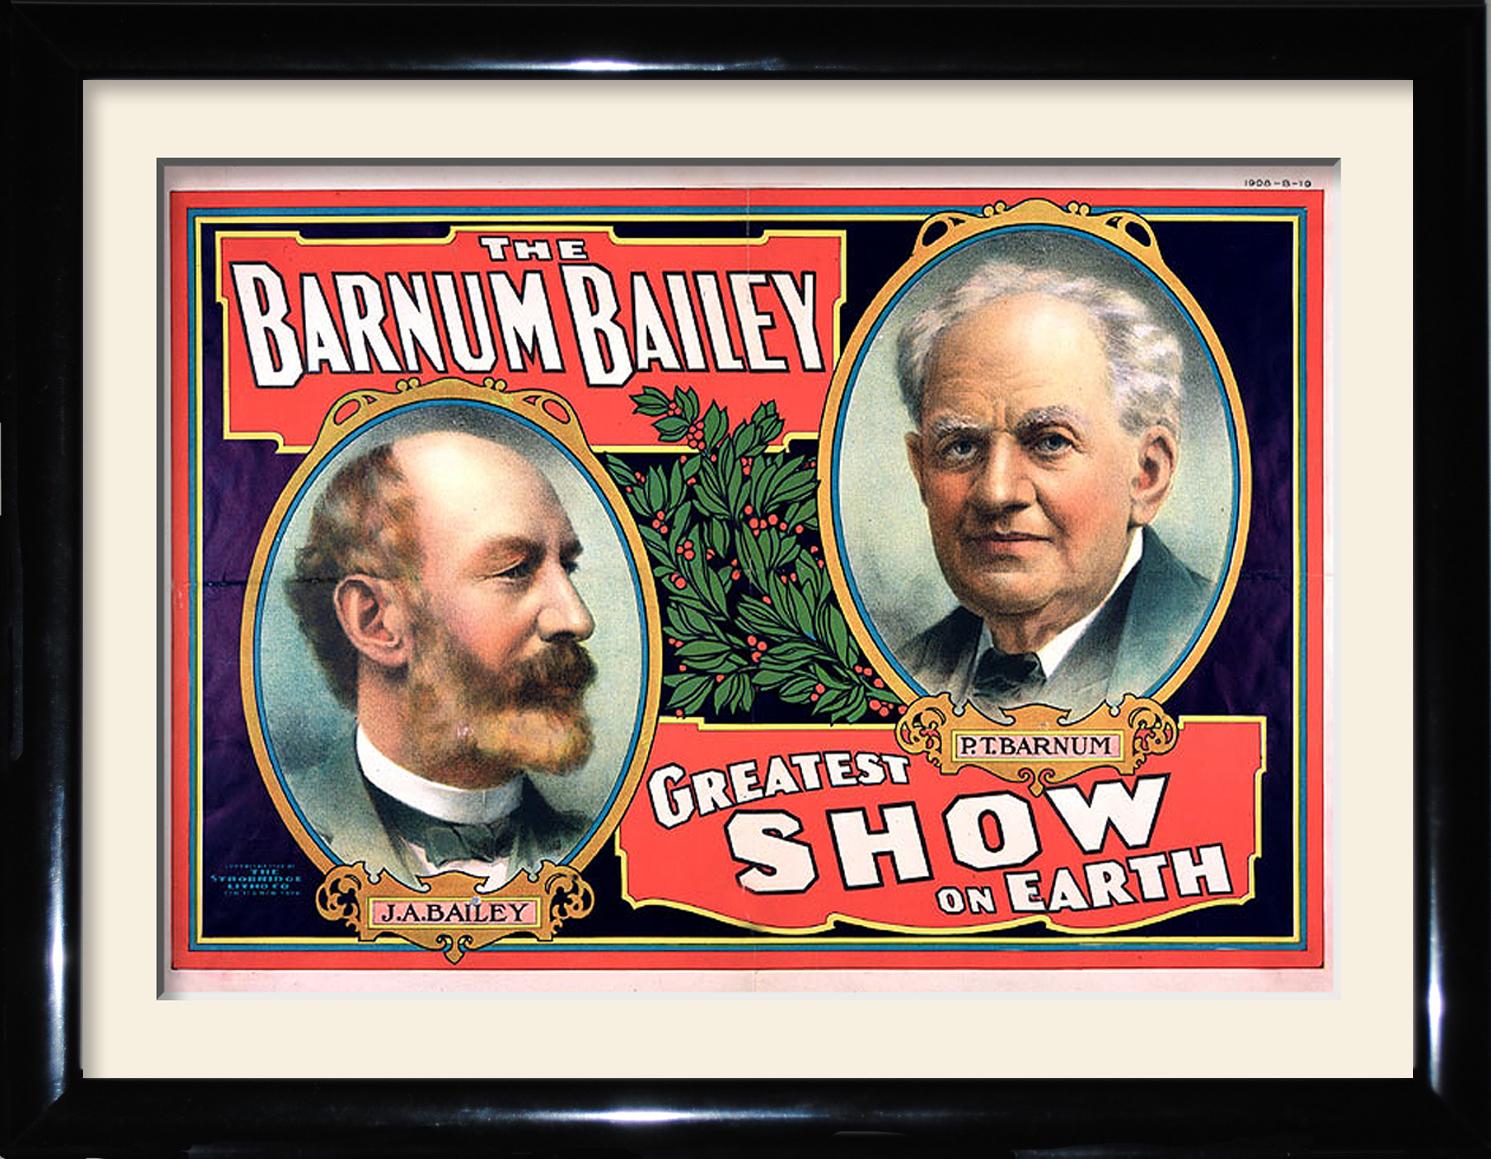 Barnum Bailey